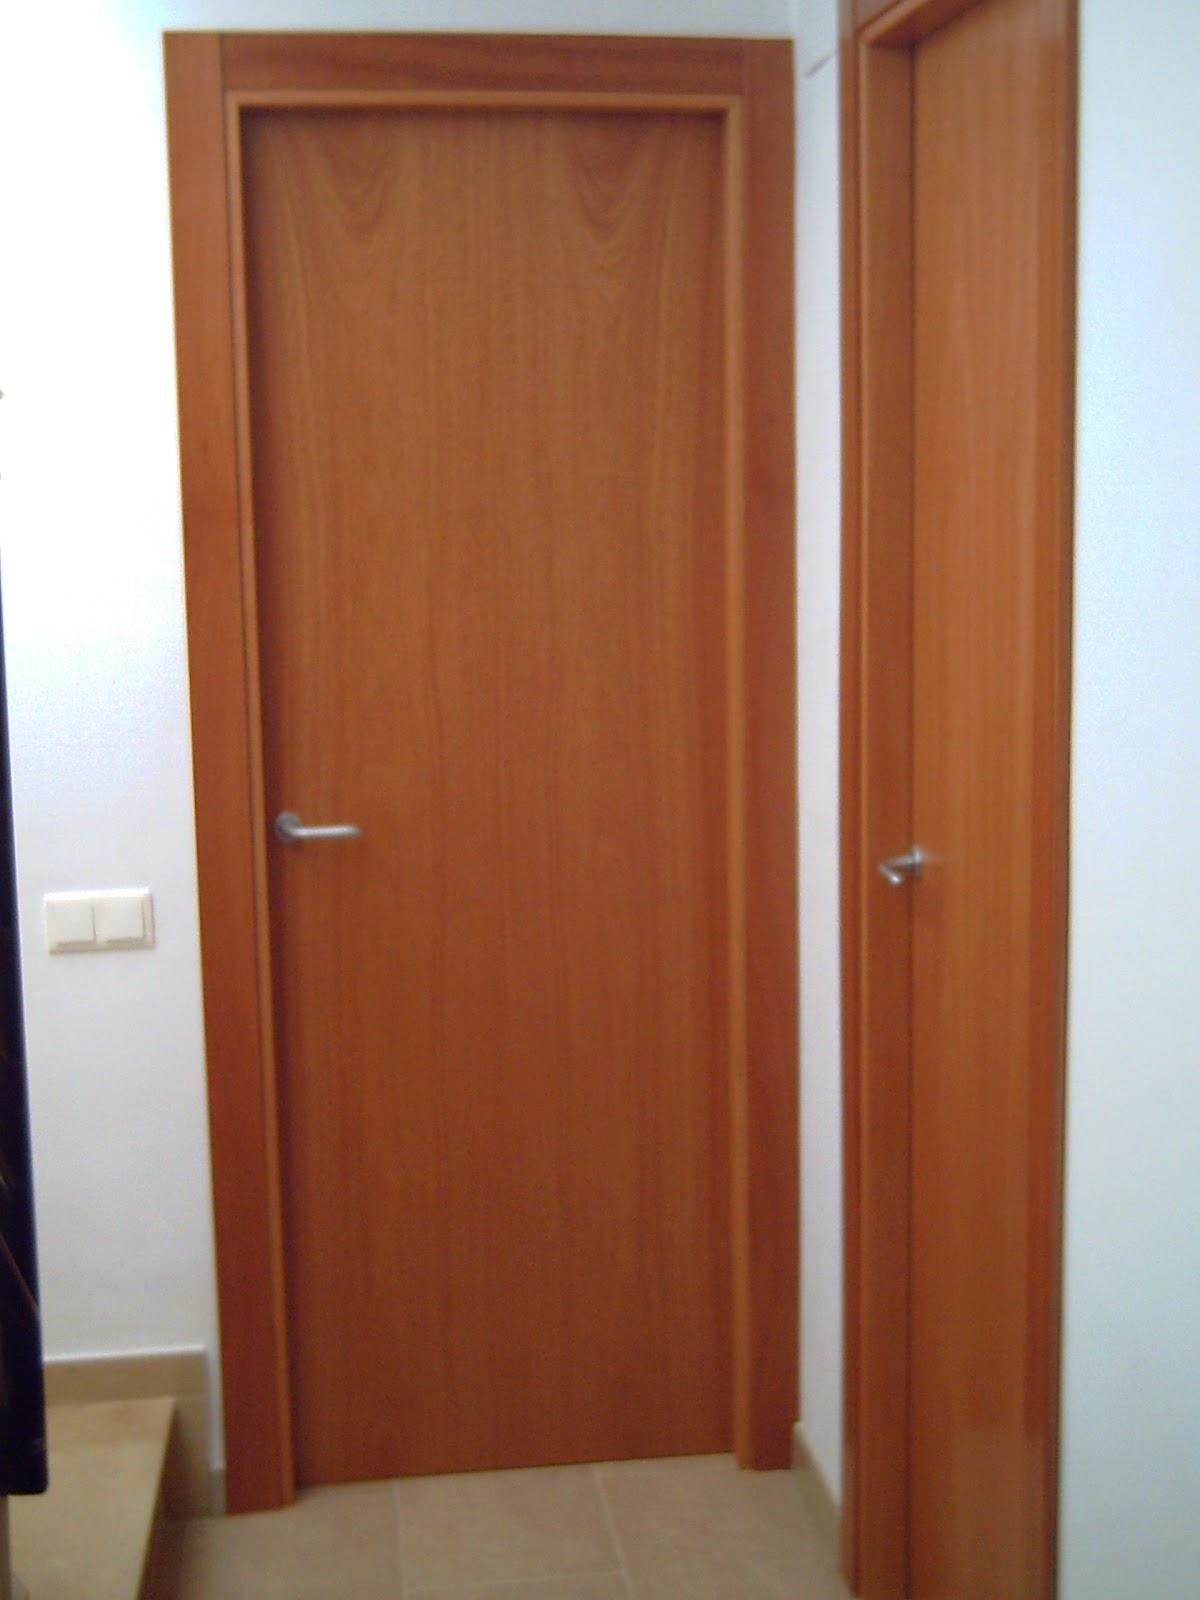 Ca uelo e hijos carpinteria s c p puertas for Puertas madera minimalistas